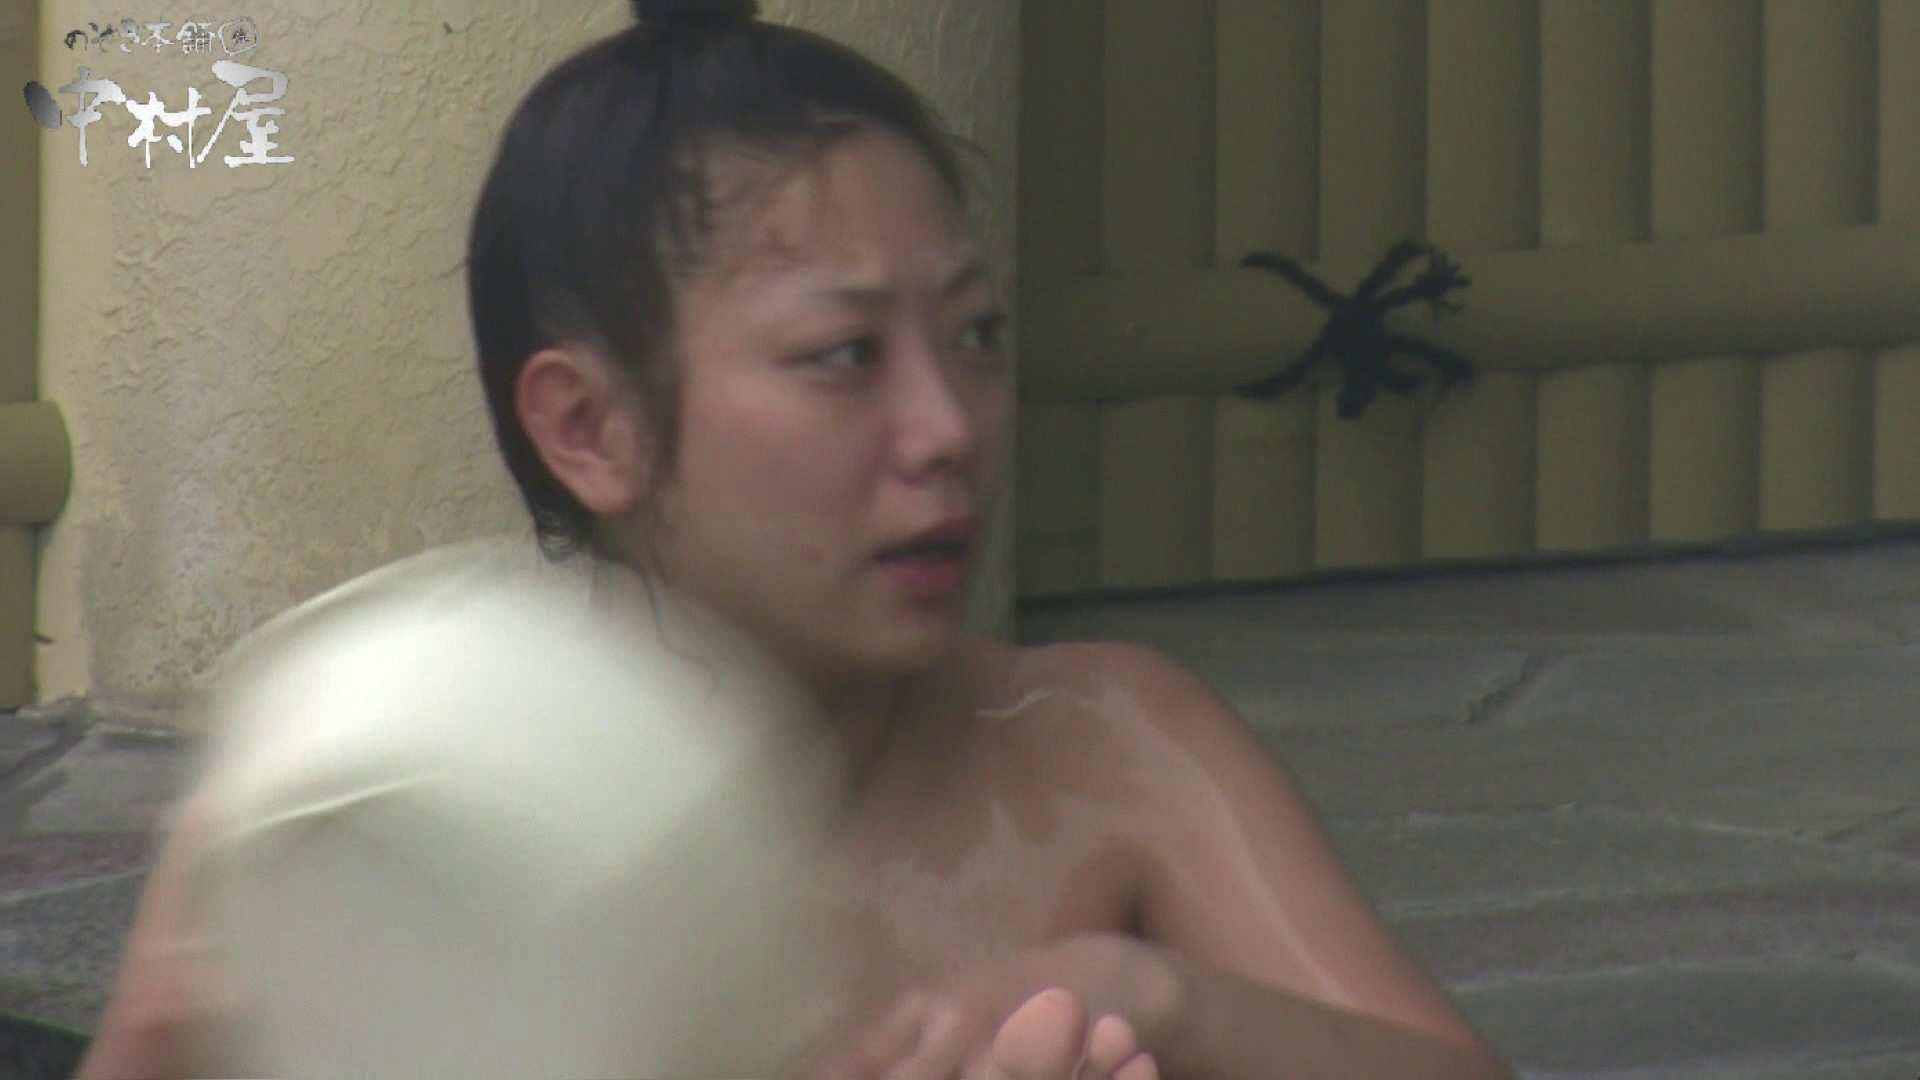 Aquaな露天風呂Vol.886 盗撮特撮 | 露天  10pic 4